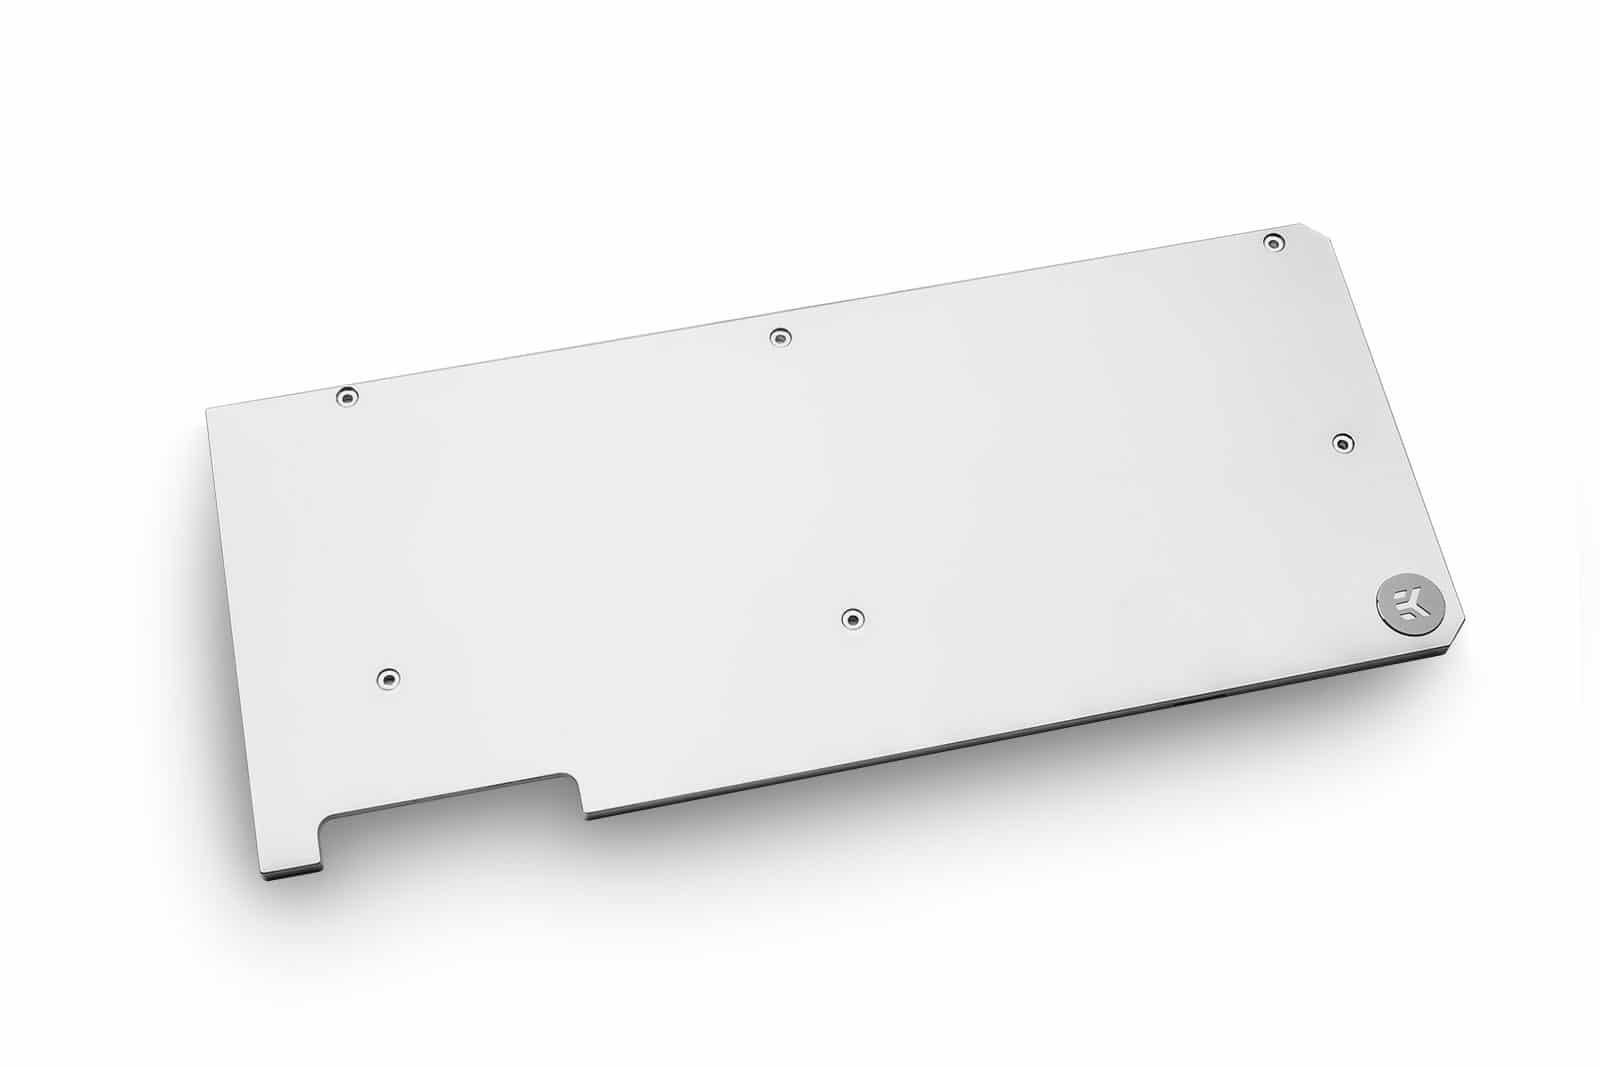 EK Quantum Vector FTW3 RTX 2080 TI backplate nickel